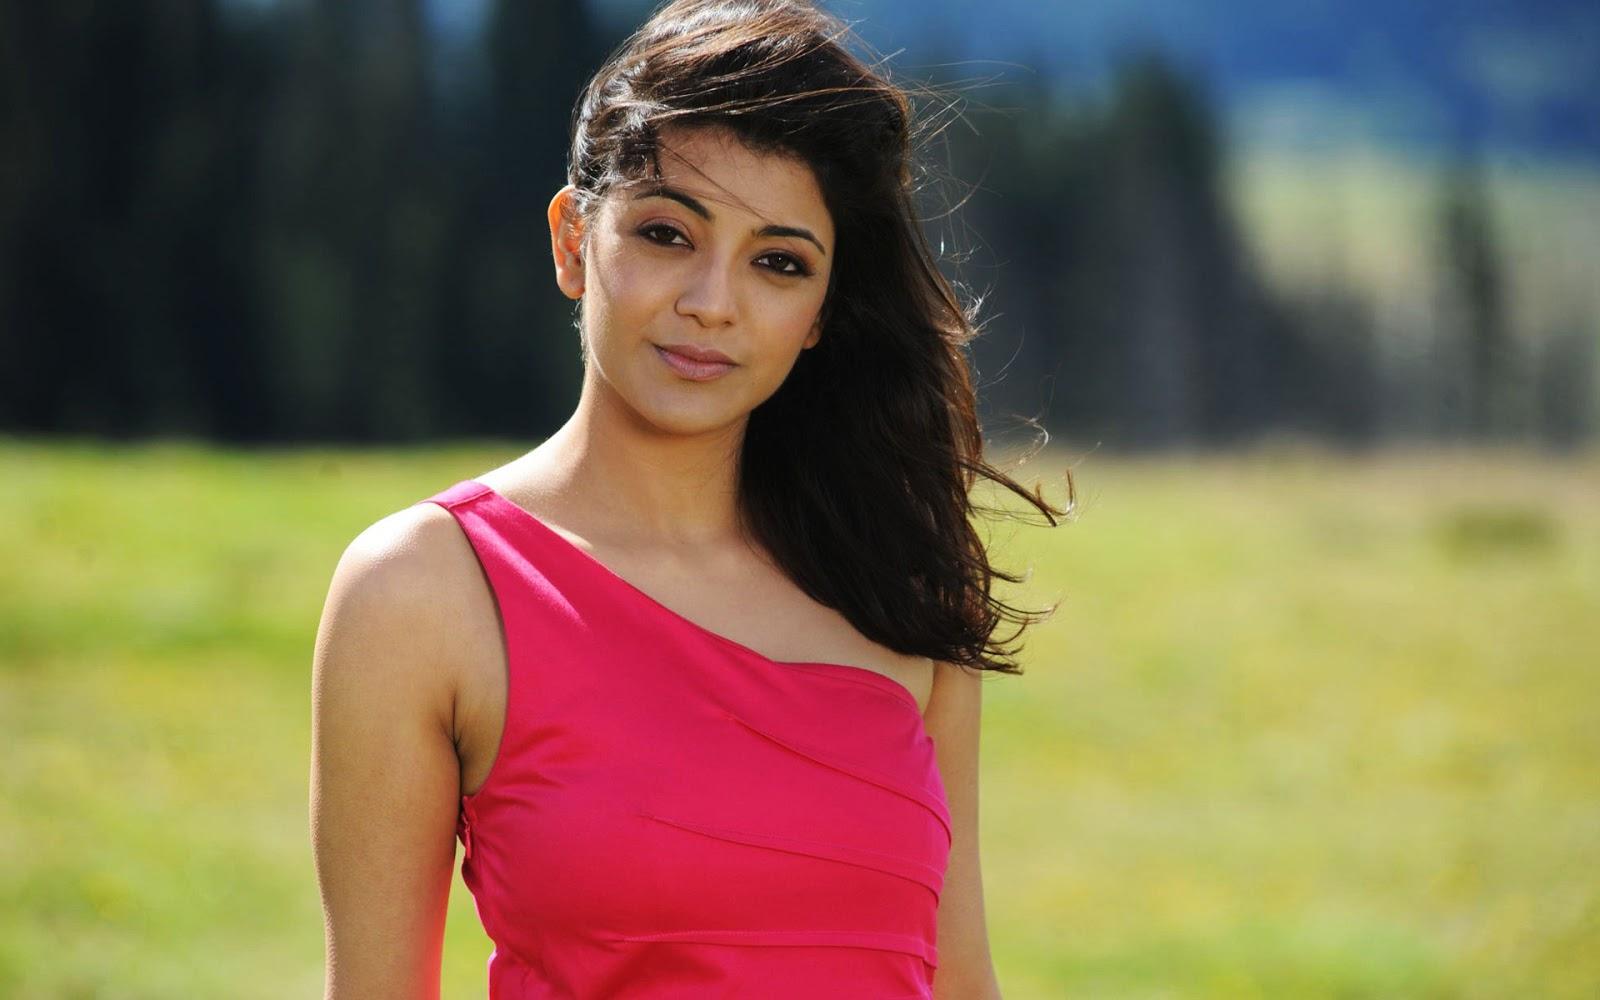 Kajal Aggarwal - A South Indian Actress Hot pics sexy bra images